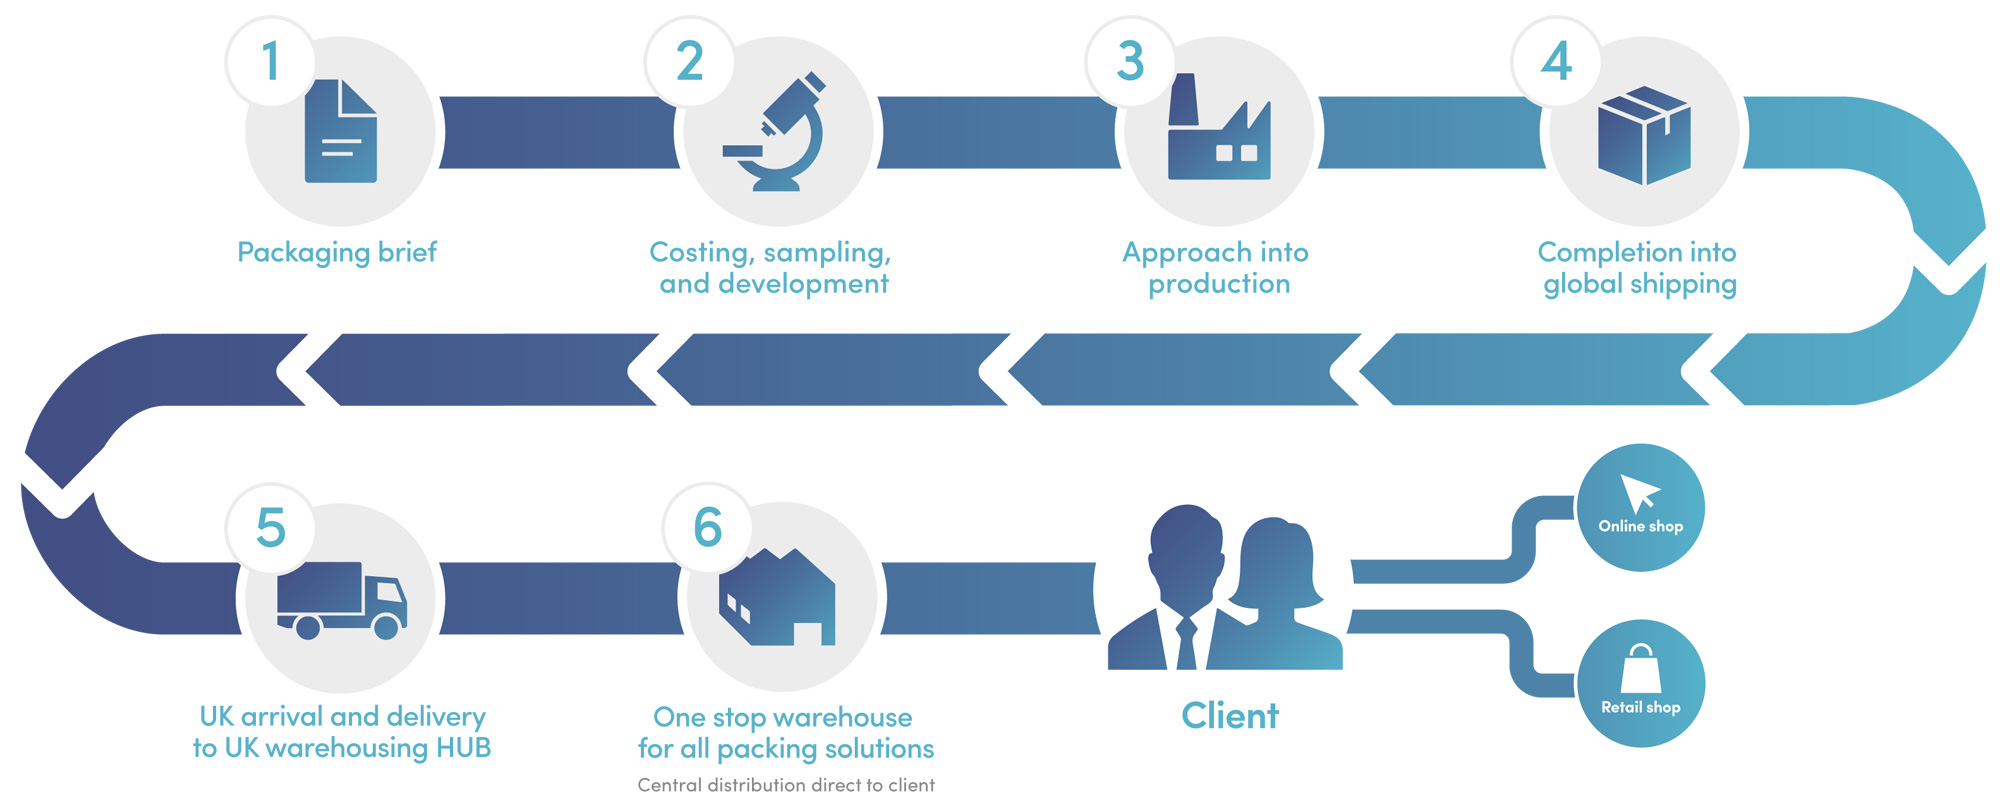 Brand Elite - Our Process - Flow chart